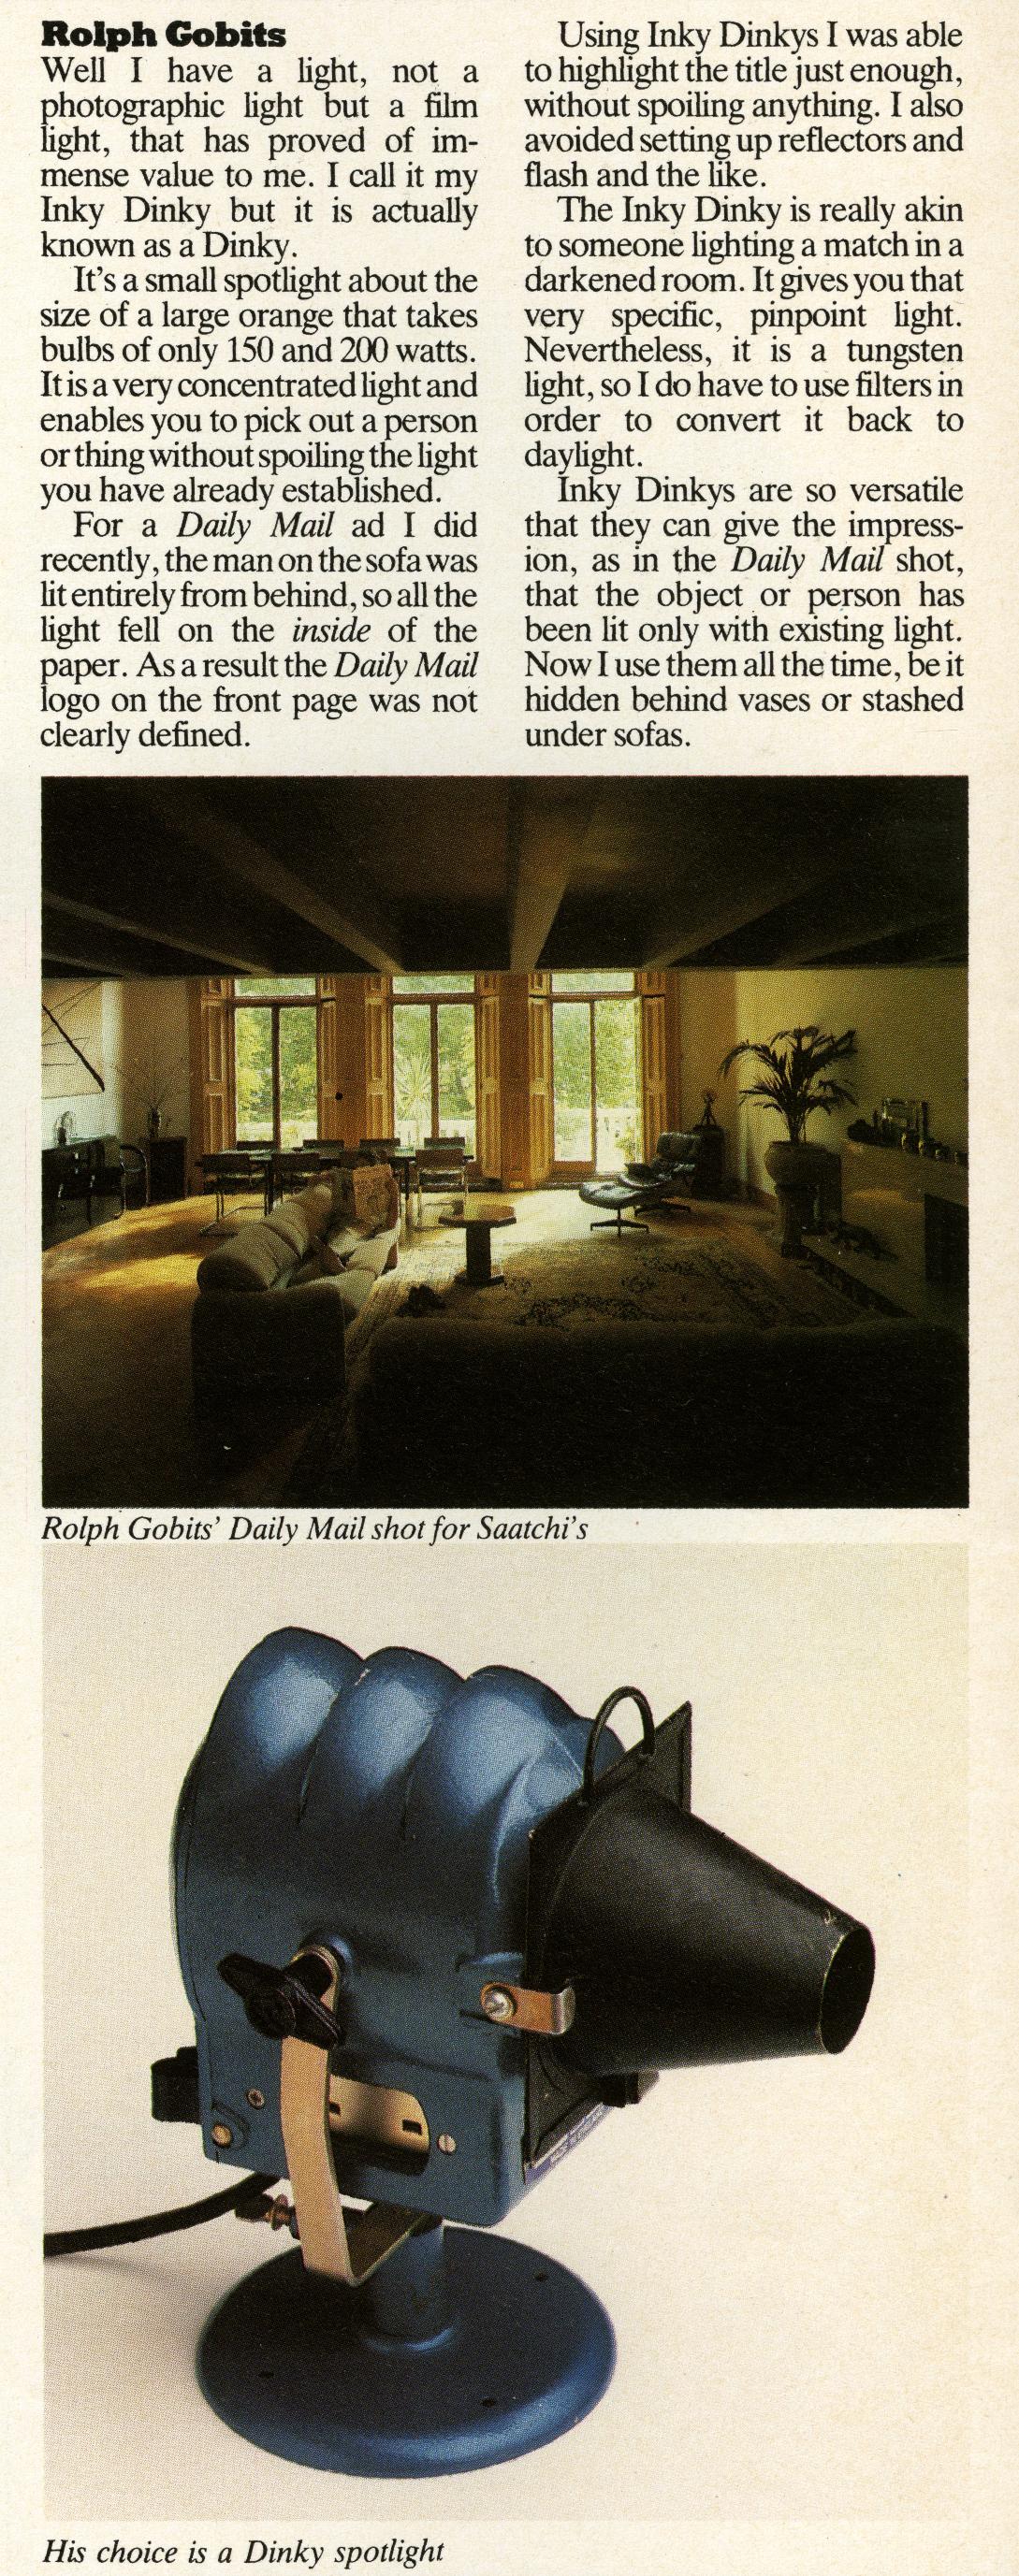 Roplh Gobits, 'Best Buy', Direction magazine-01